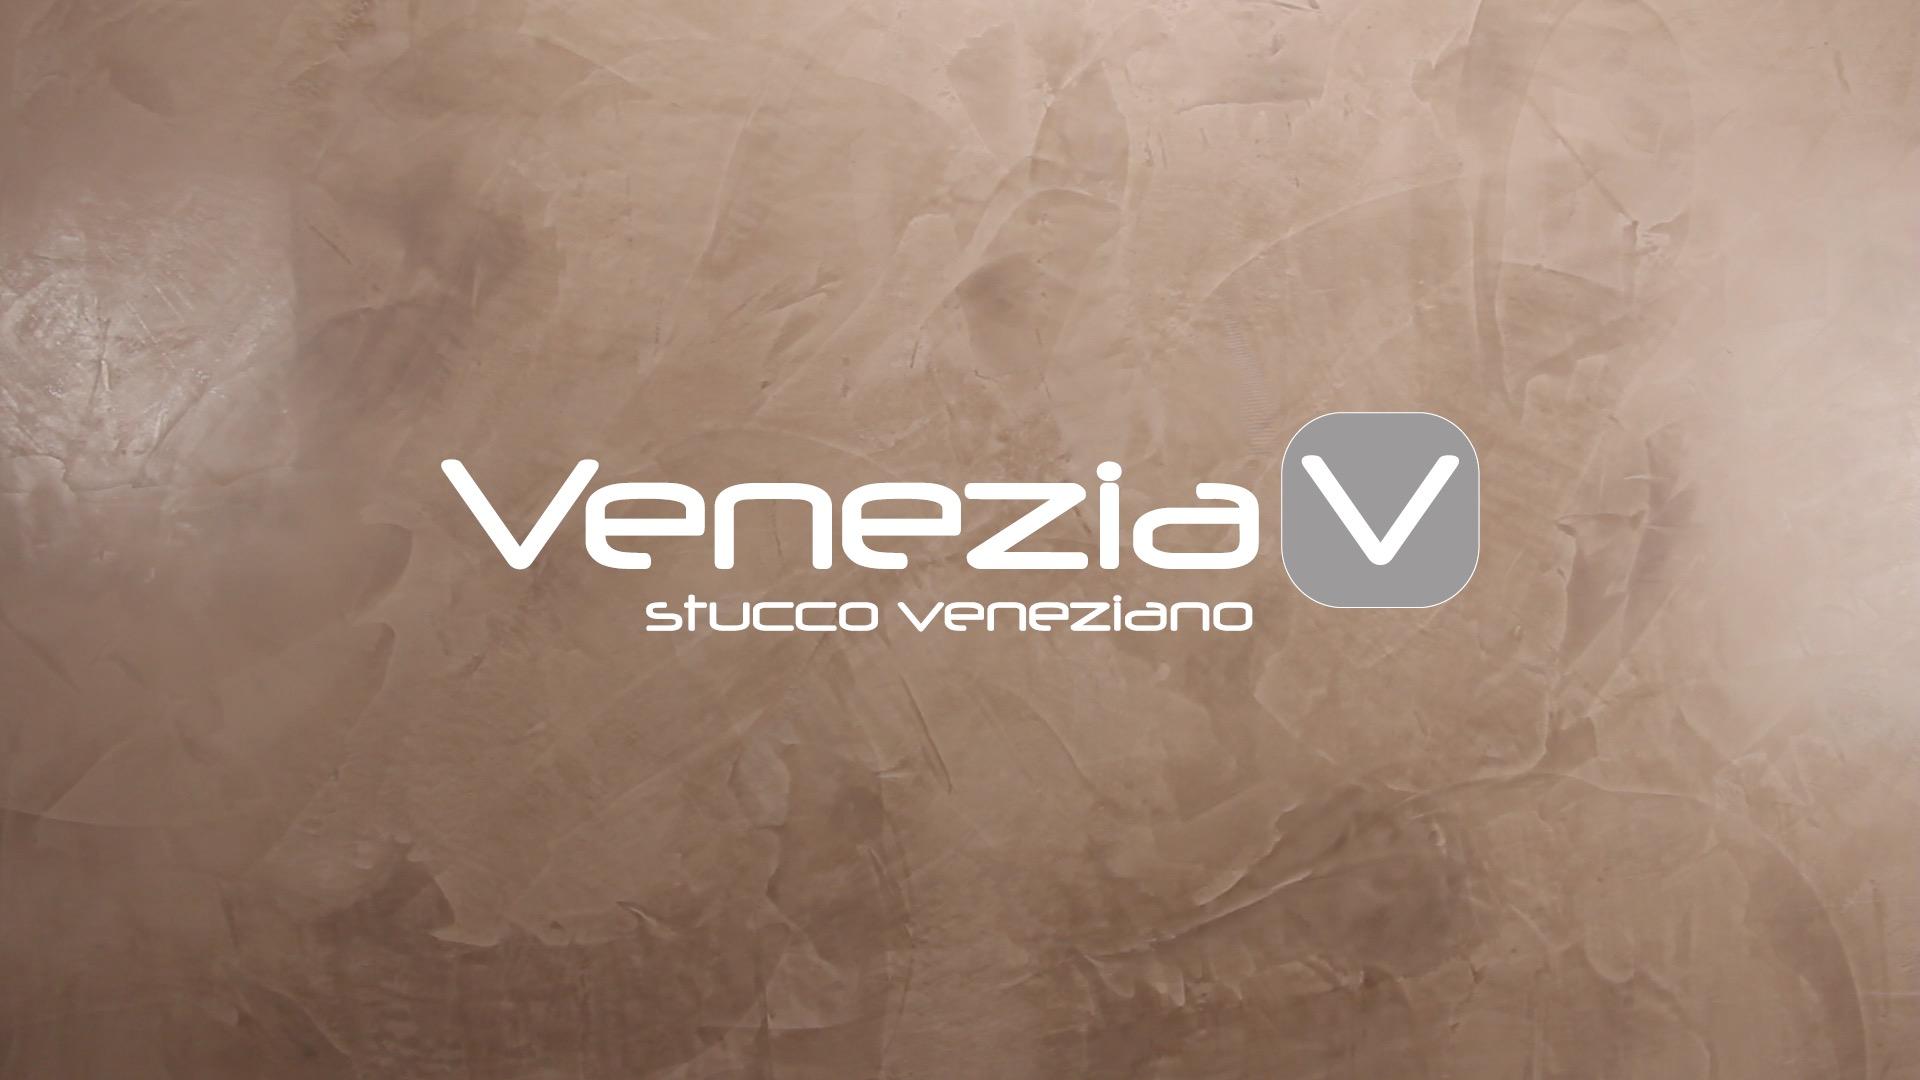 VeneziaV